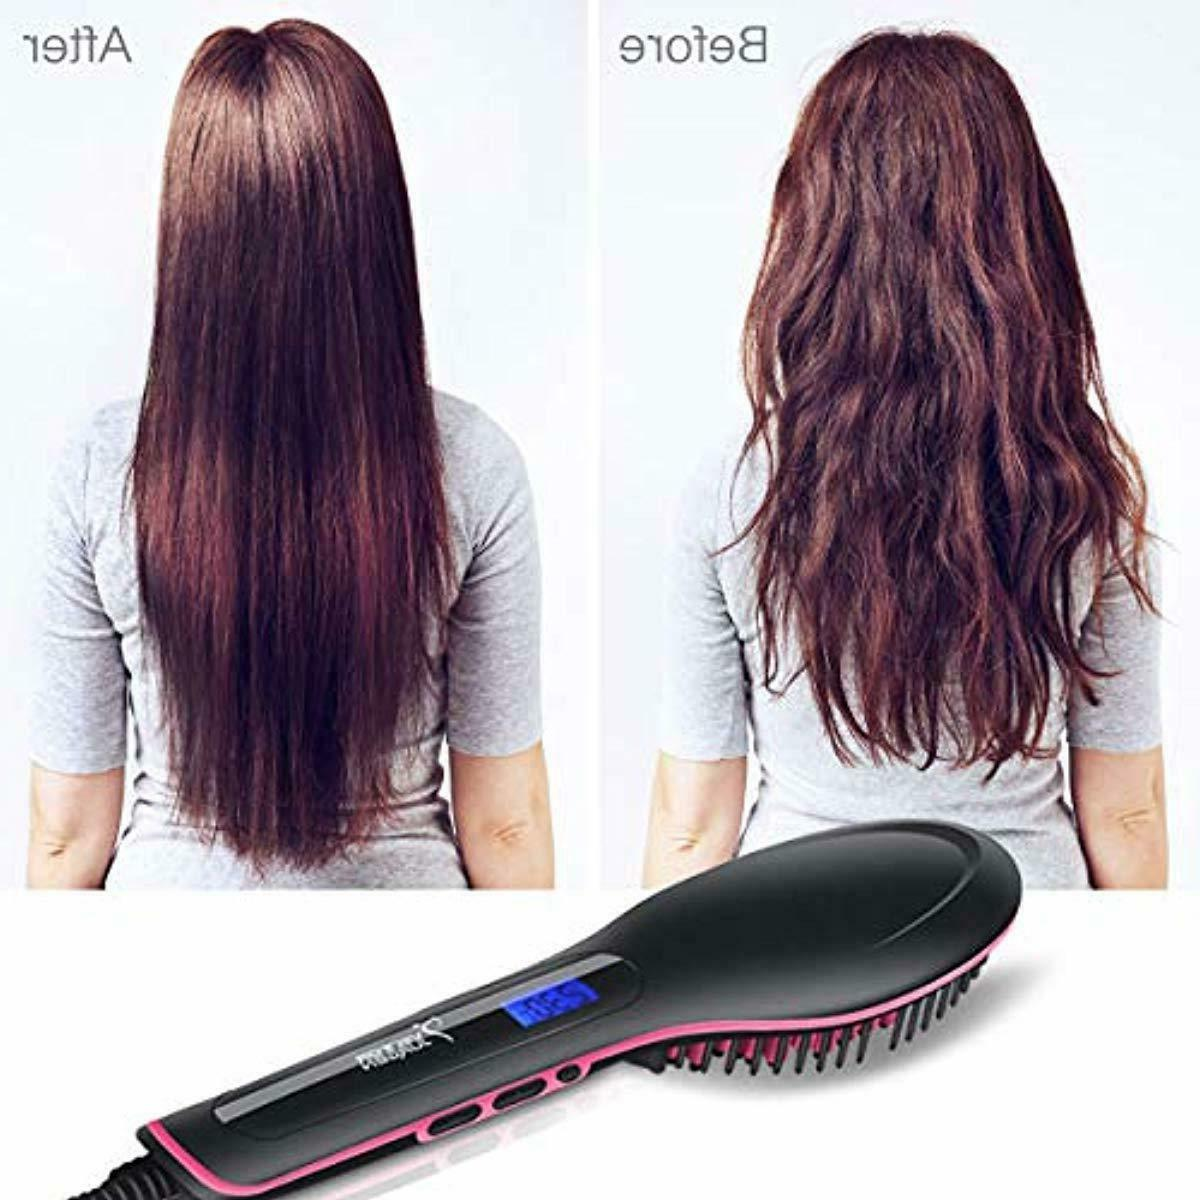 VIKTOR Brush Straight Hair S